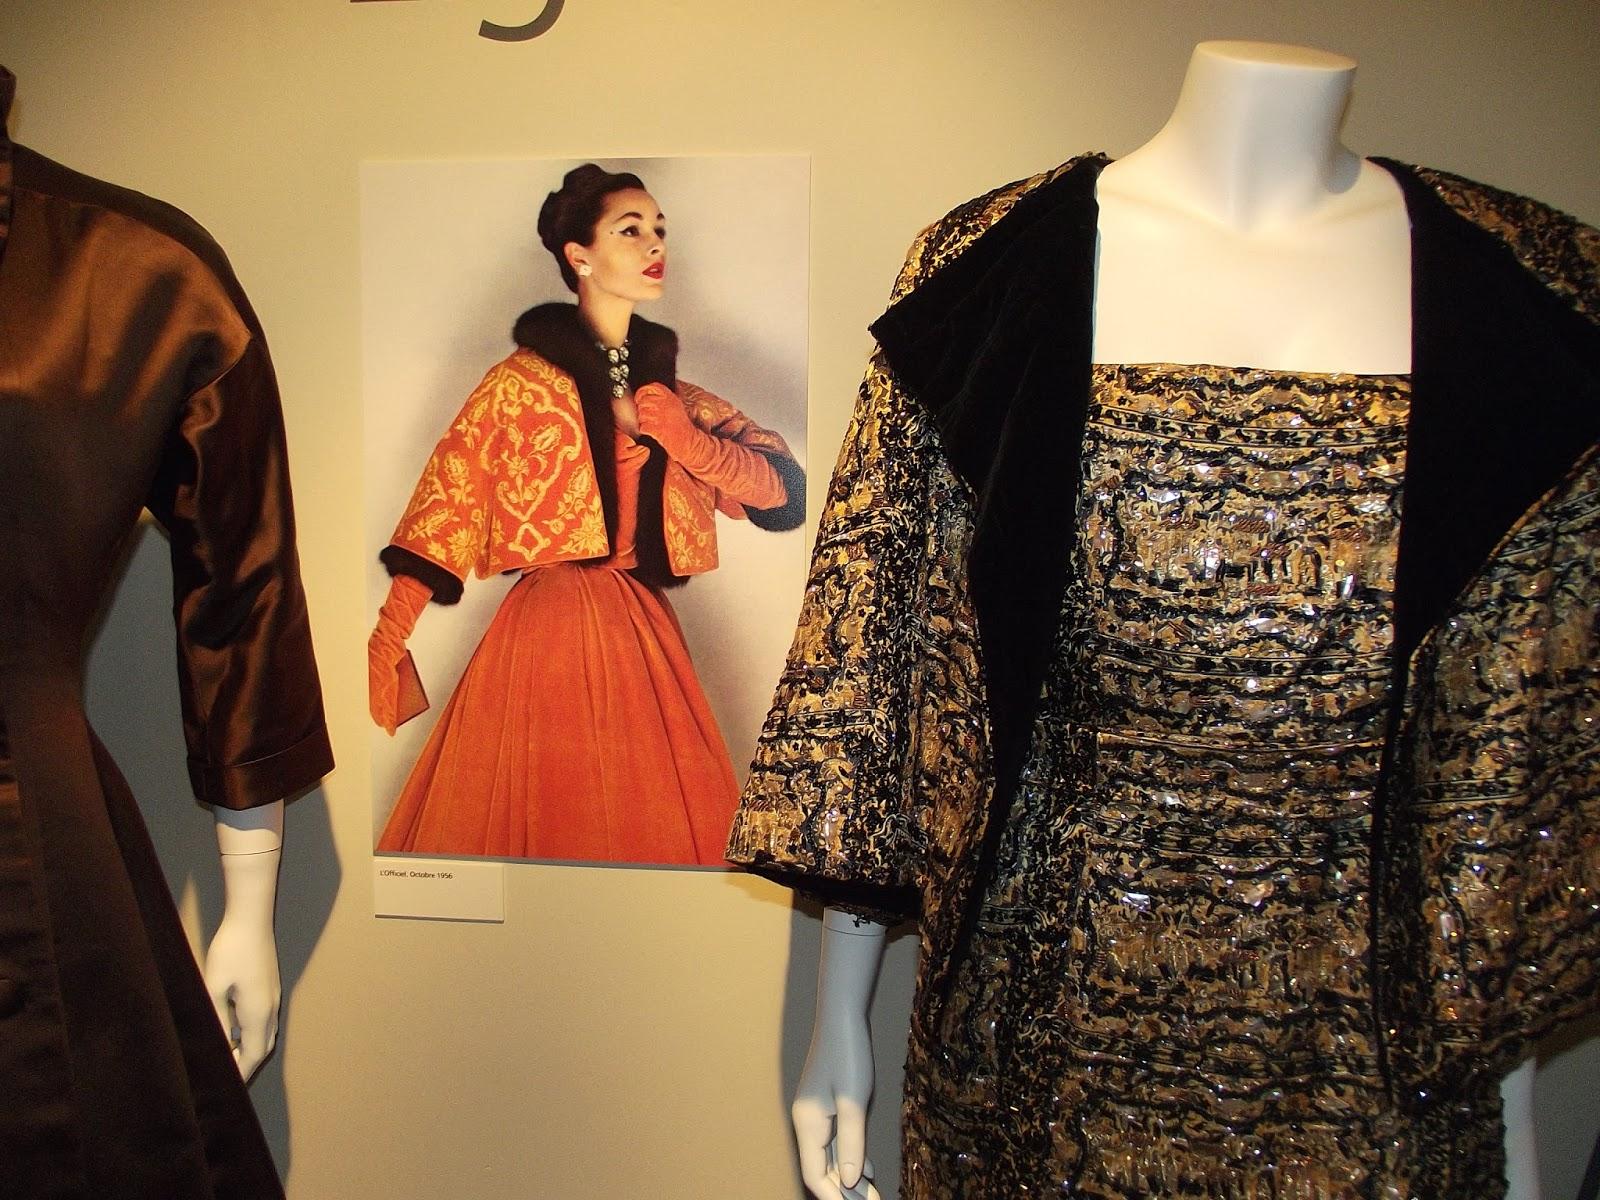 Christian Dior exhibition